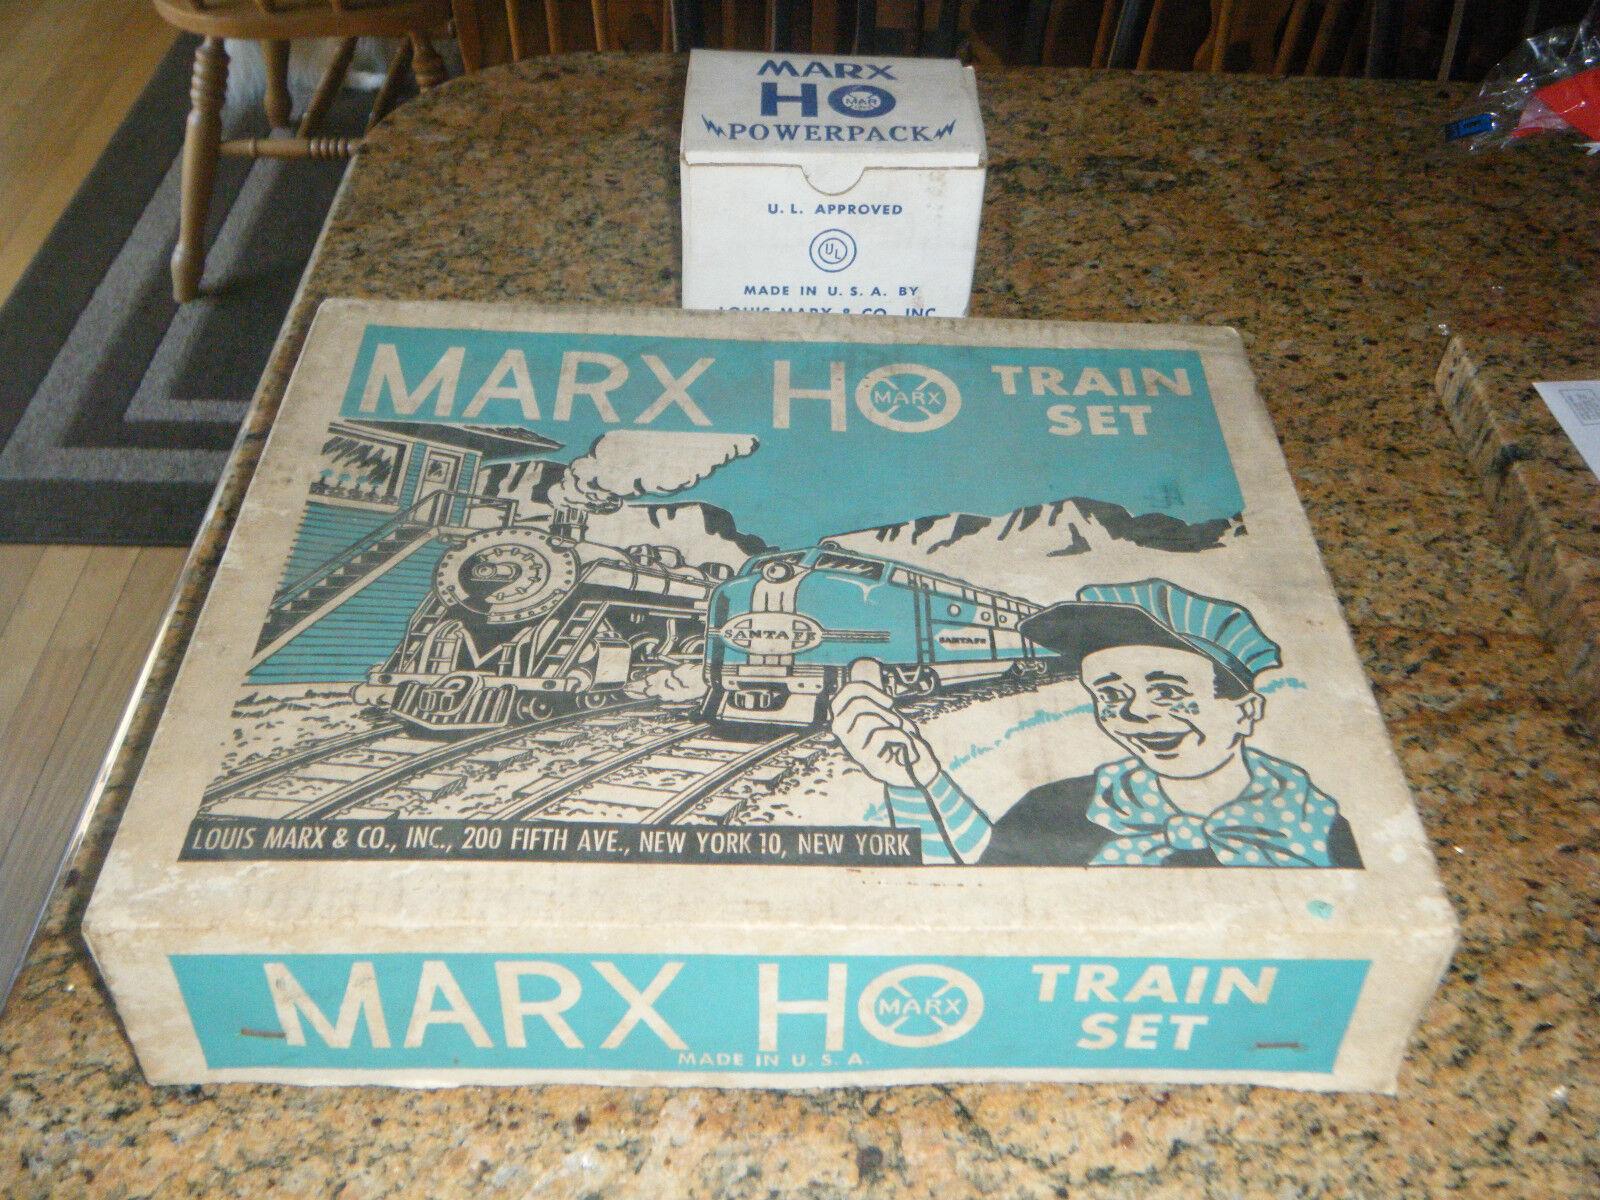 MARX HO TRAIN SET ORIGINAL scatola  16455 energiaPACK  6029 LOT TRACK nuovo HAVEN ENGINE